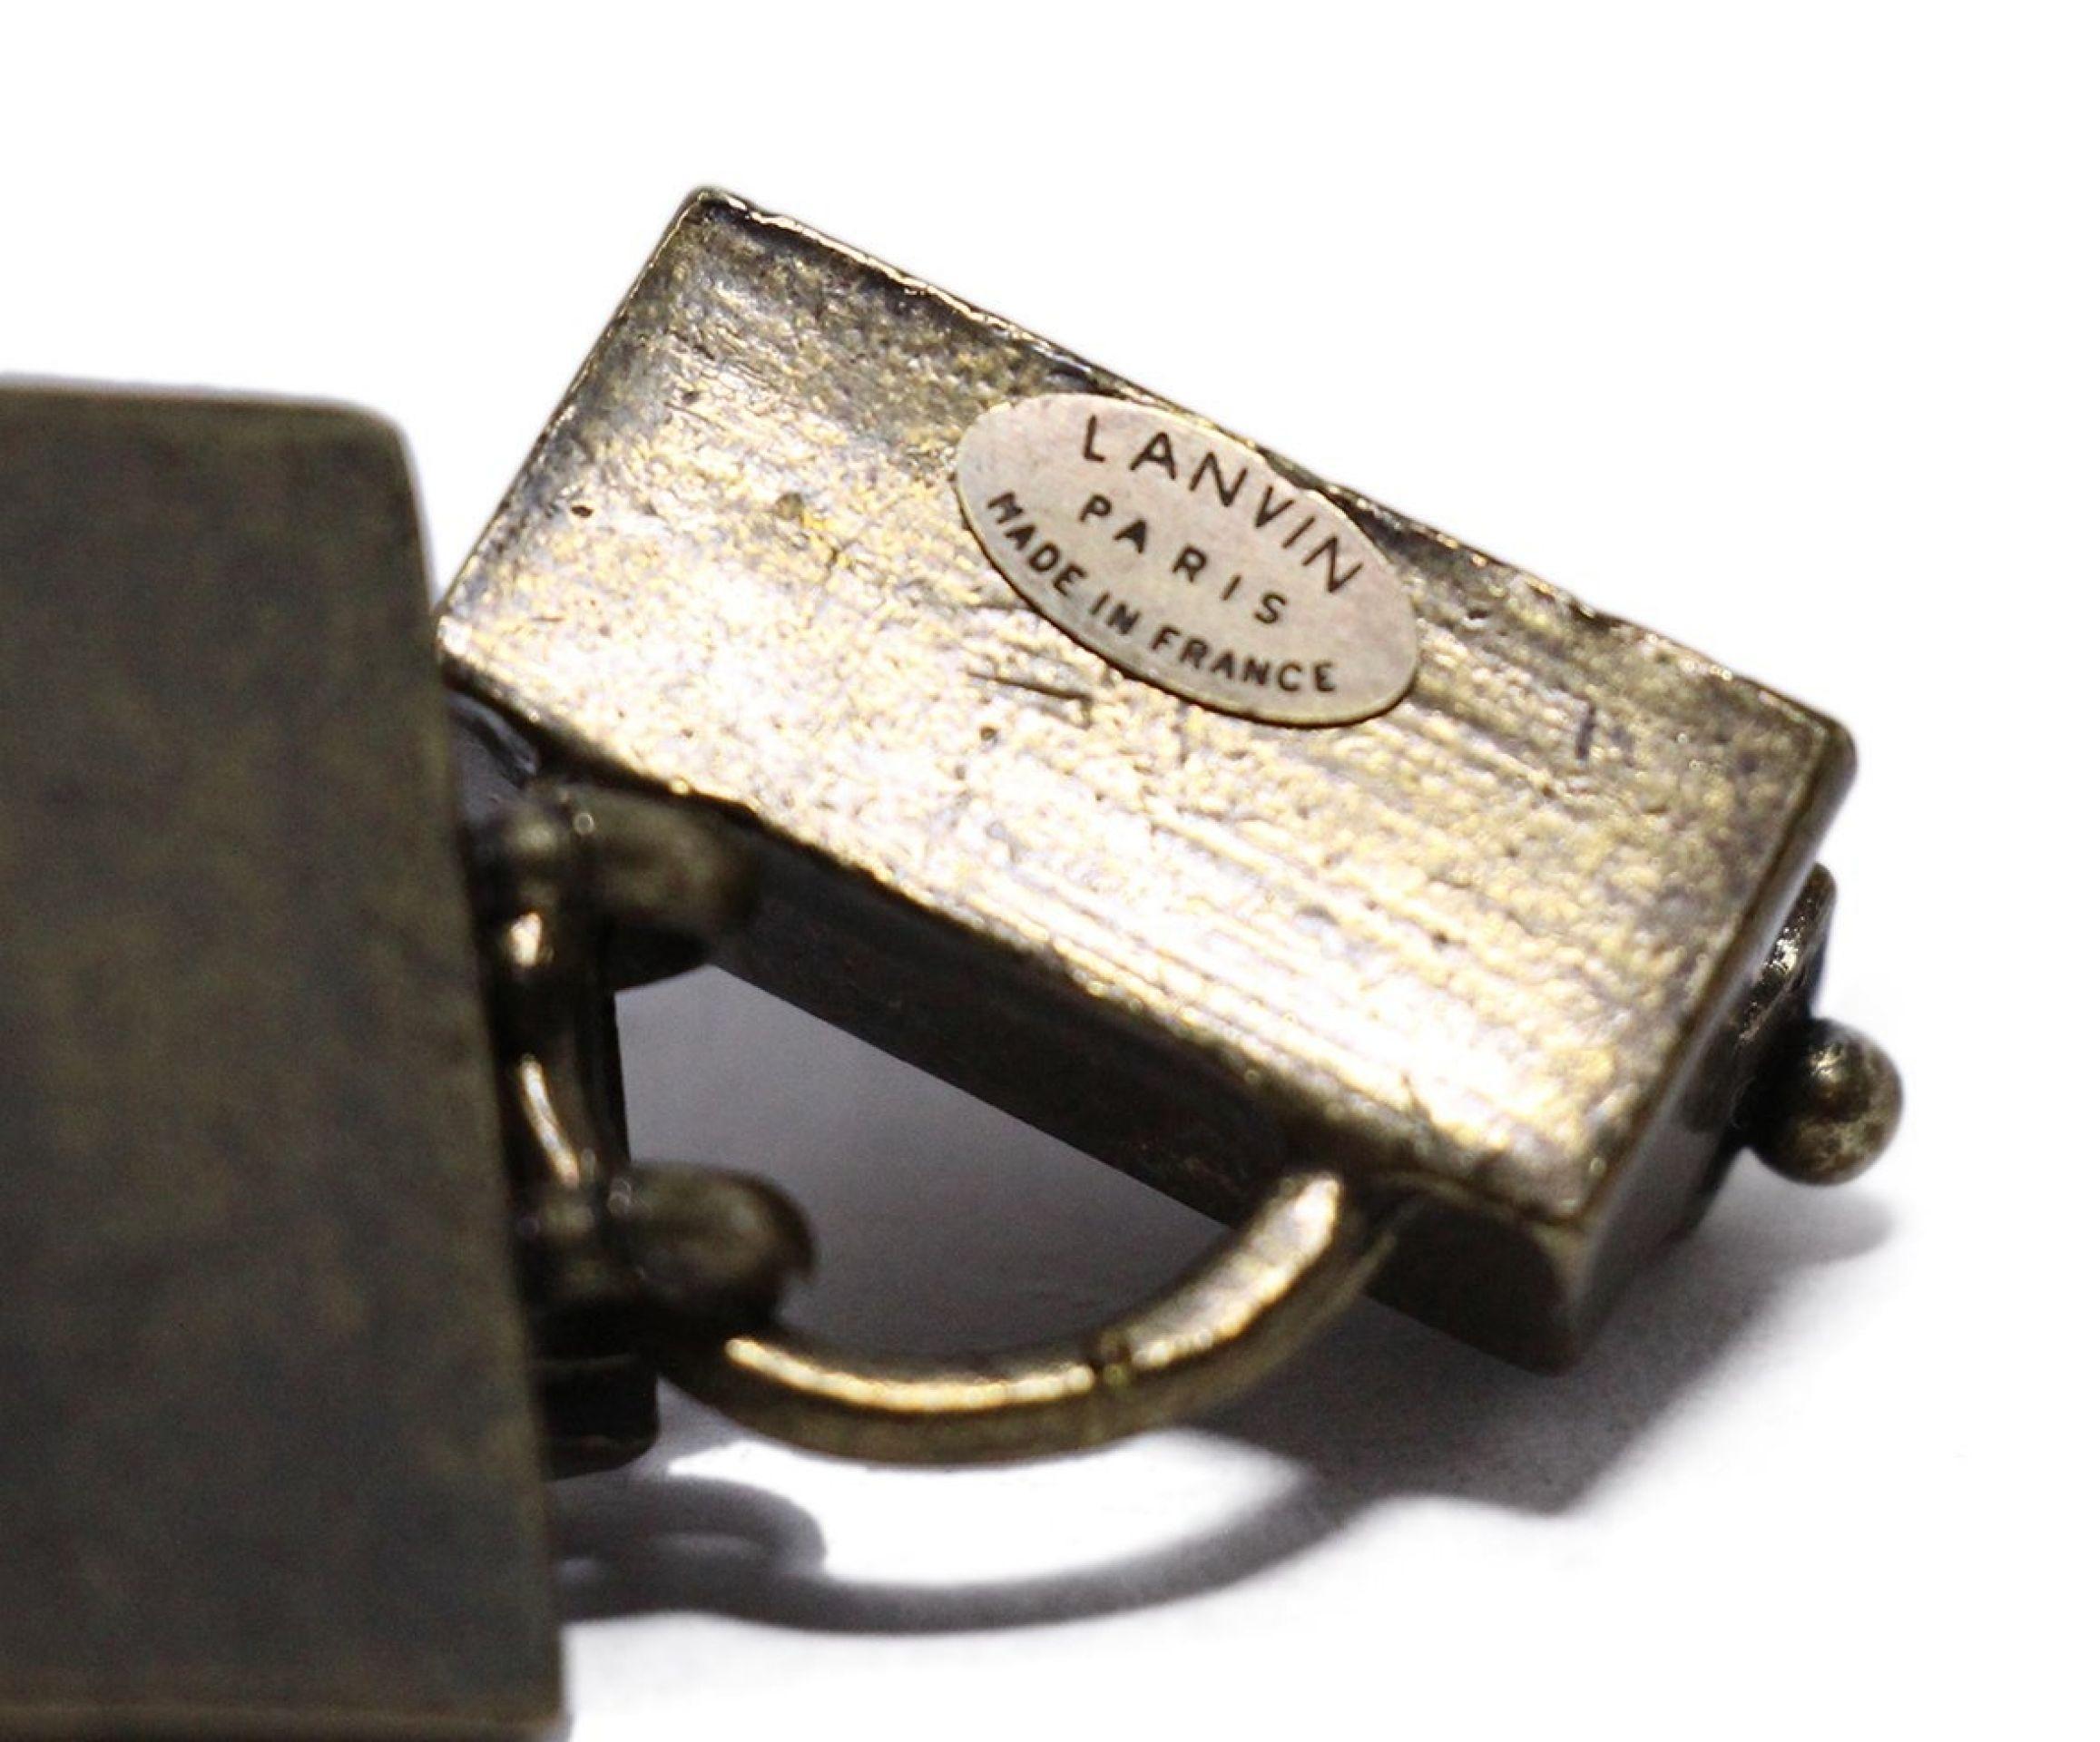 LANVIN METALLIC GOLD WITH RHINESTONES COPPER CHAIN BRACELET